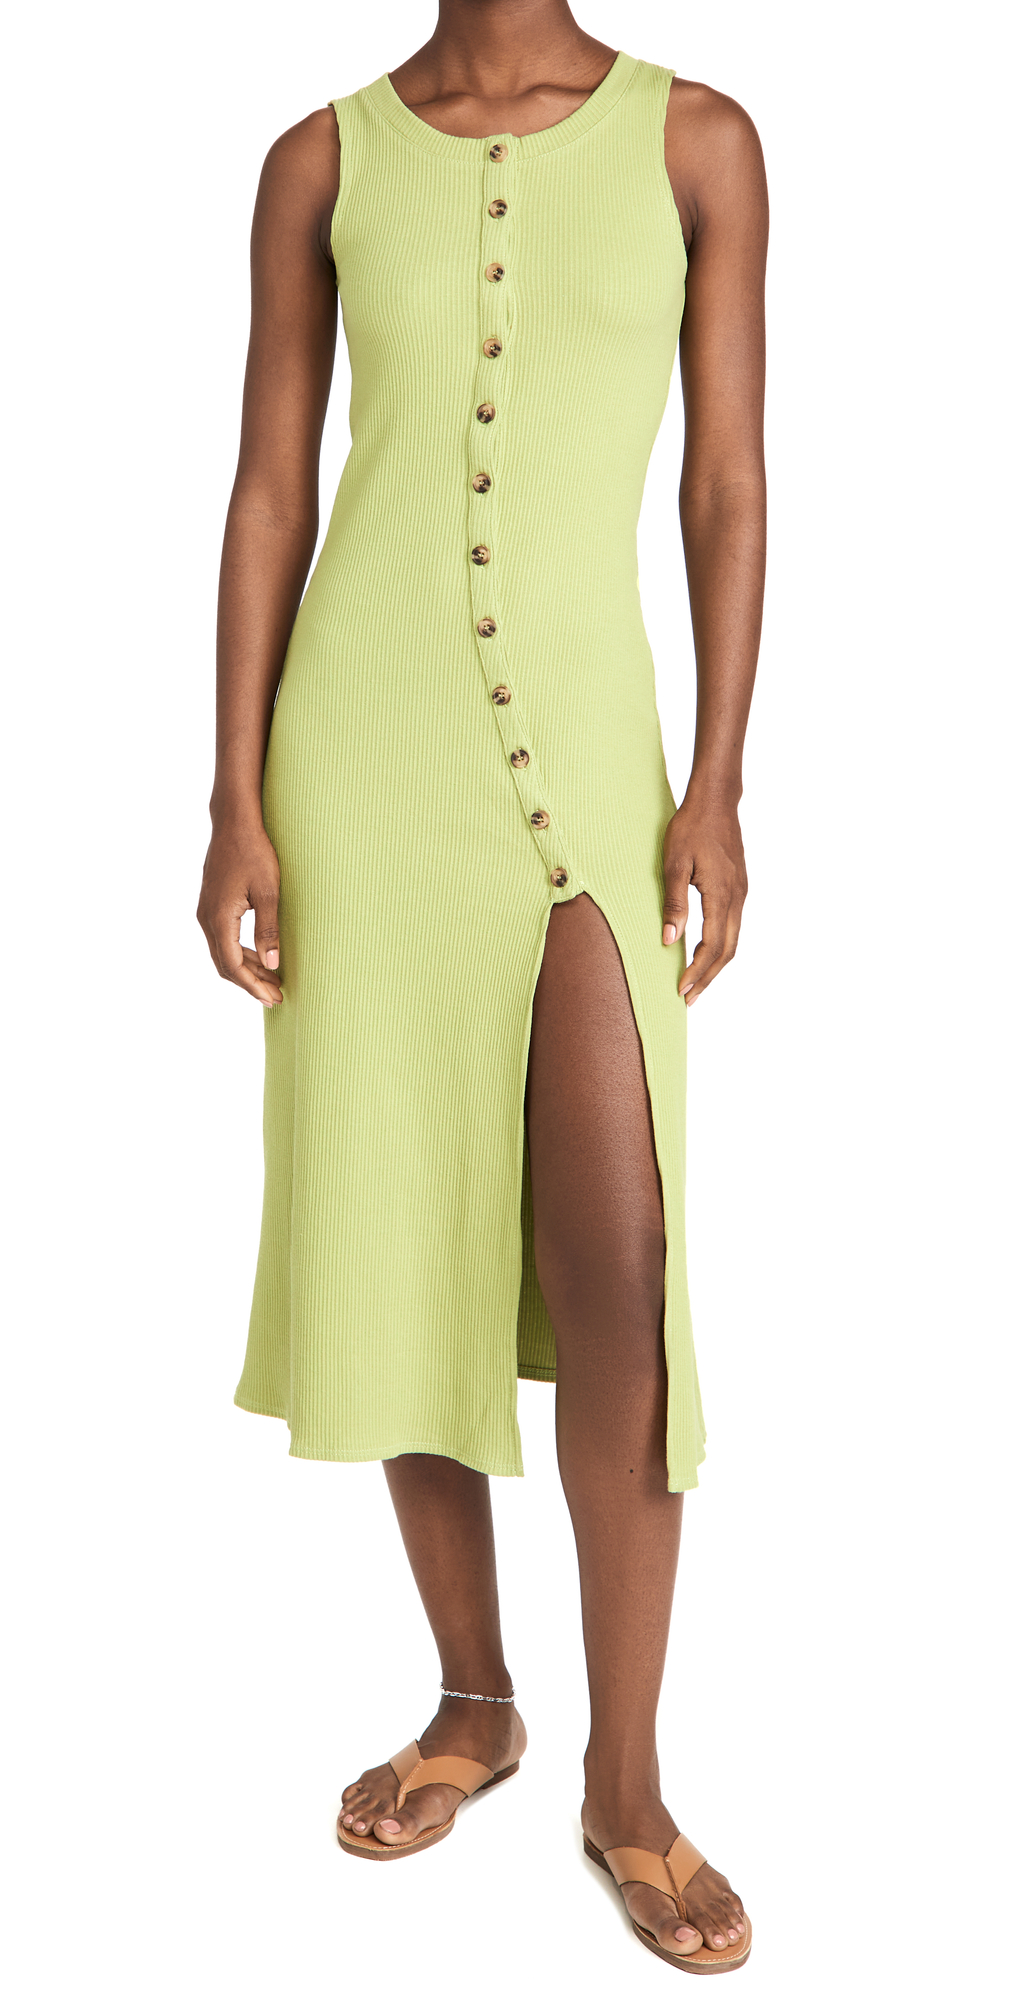 Rue Knit Button Front Dress